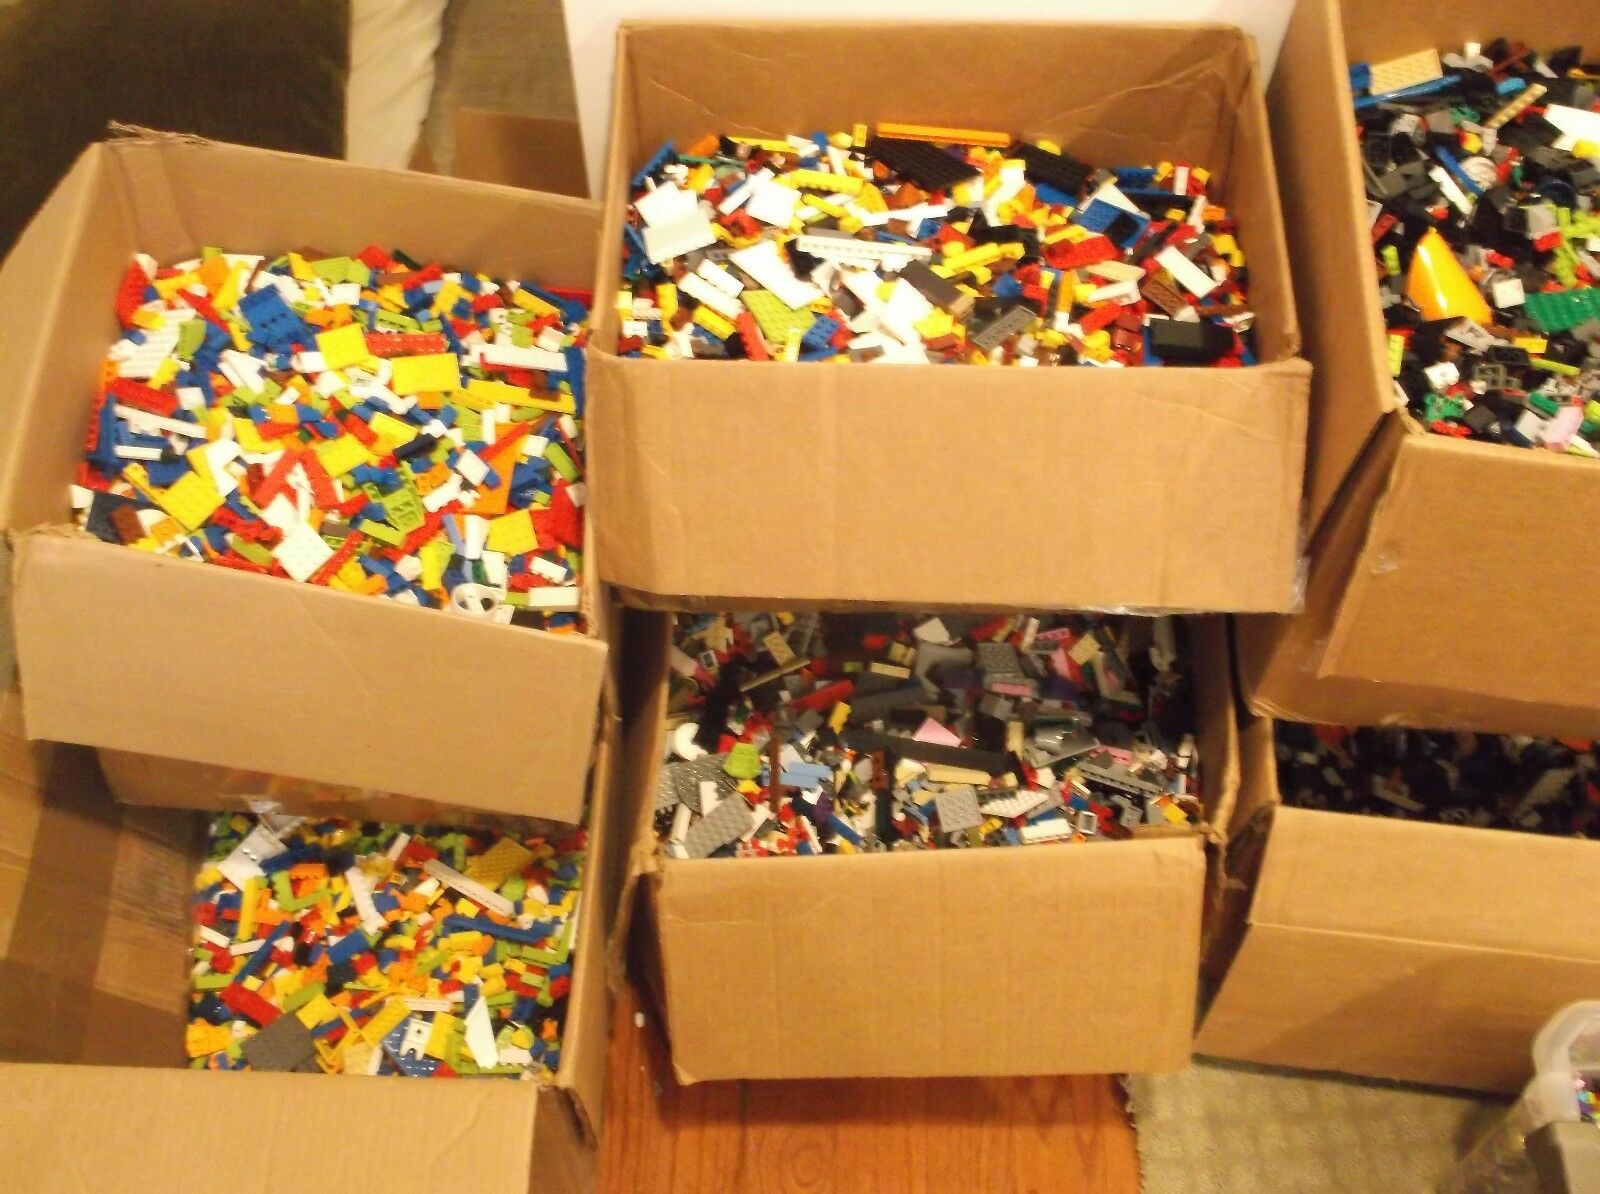 Clean 100% Genuine LEGO by the Pound - 1 - 100 pounds Bulk LOT Large Order Bonus